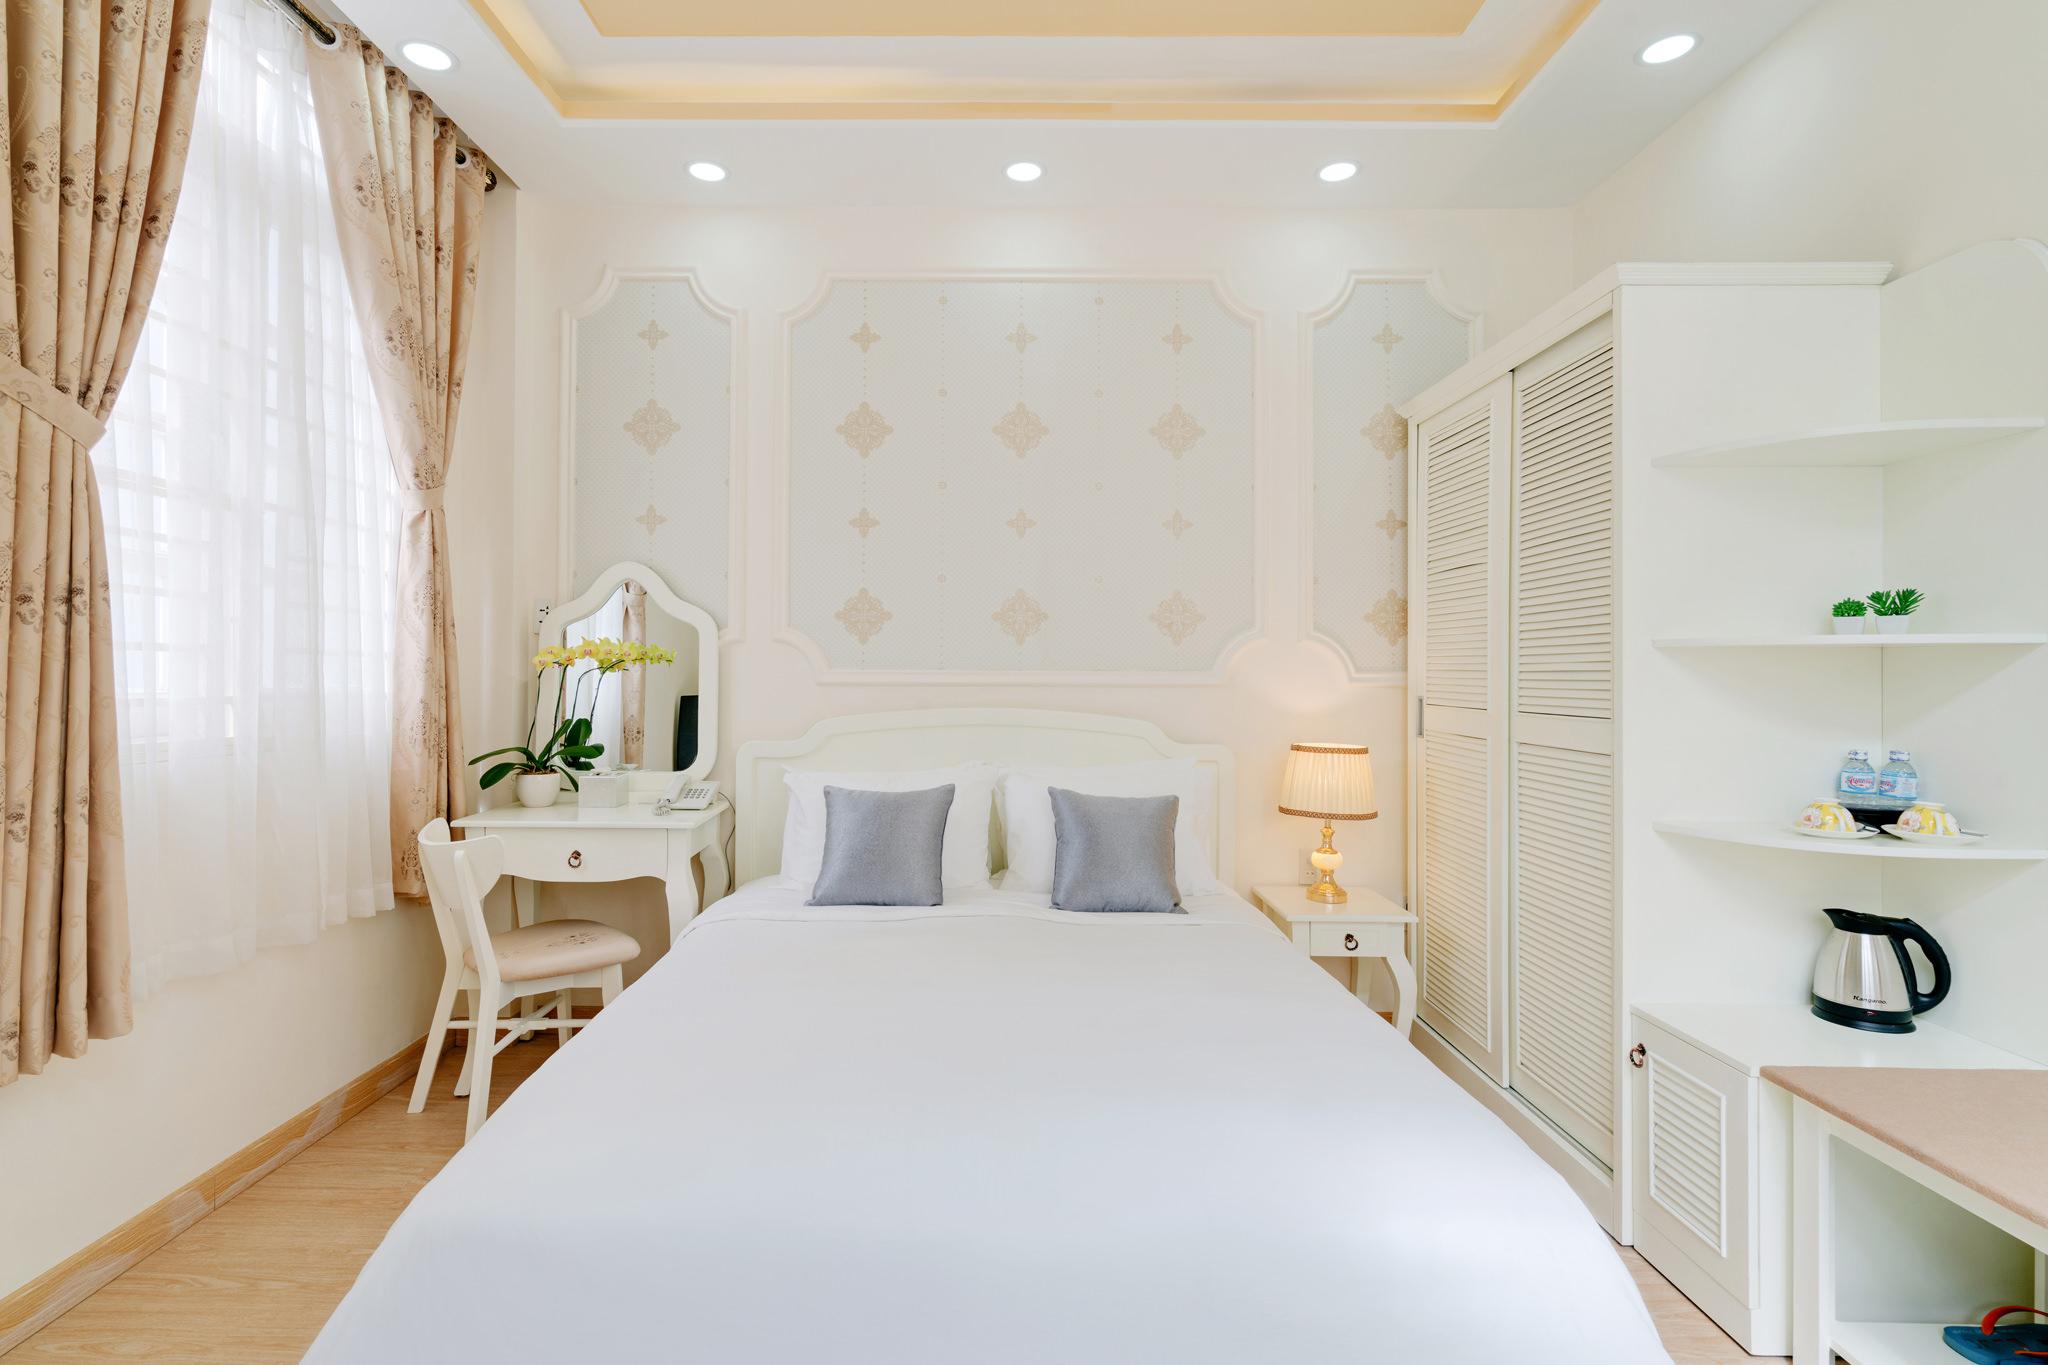 20180529 - Chez Mimosa - Interior - Hotel - 003.jpg